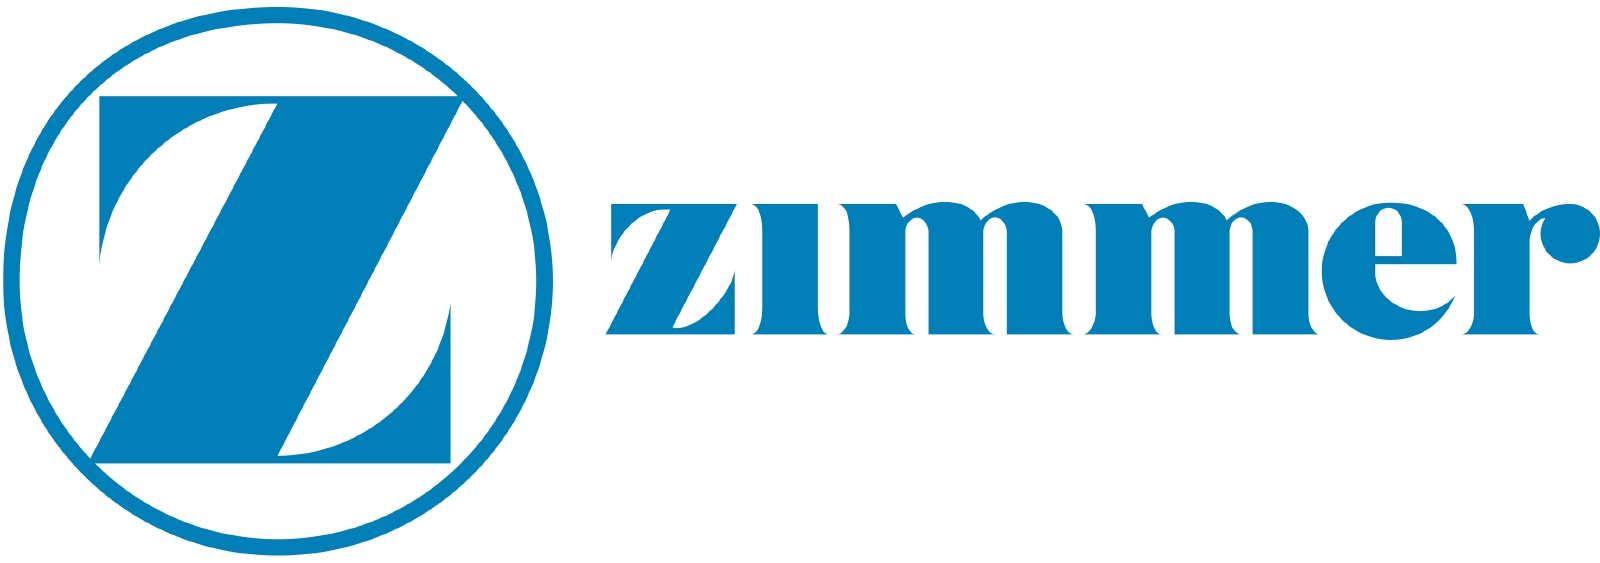 Zimmer_logo-1